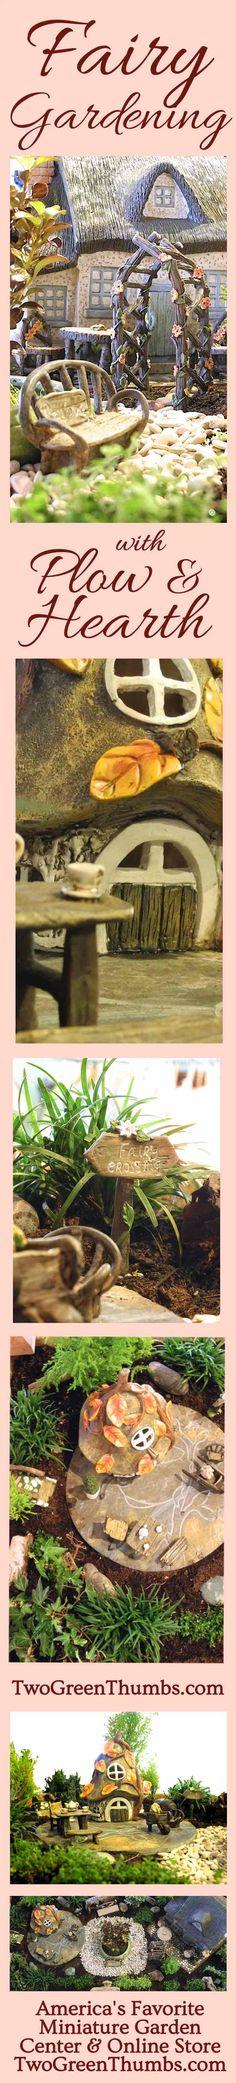 Janit Calvo's Fairy Garden built for Plow & Hearth